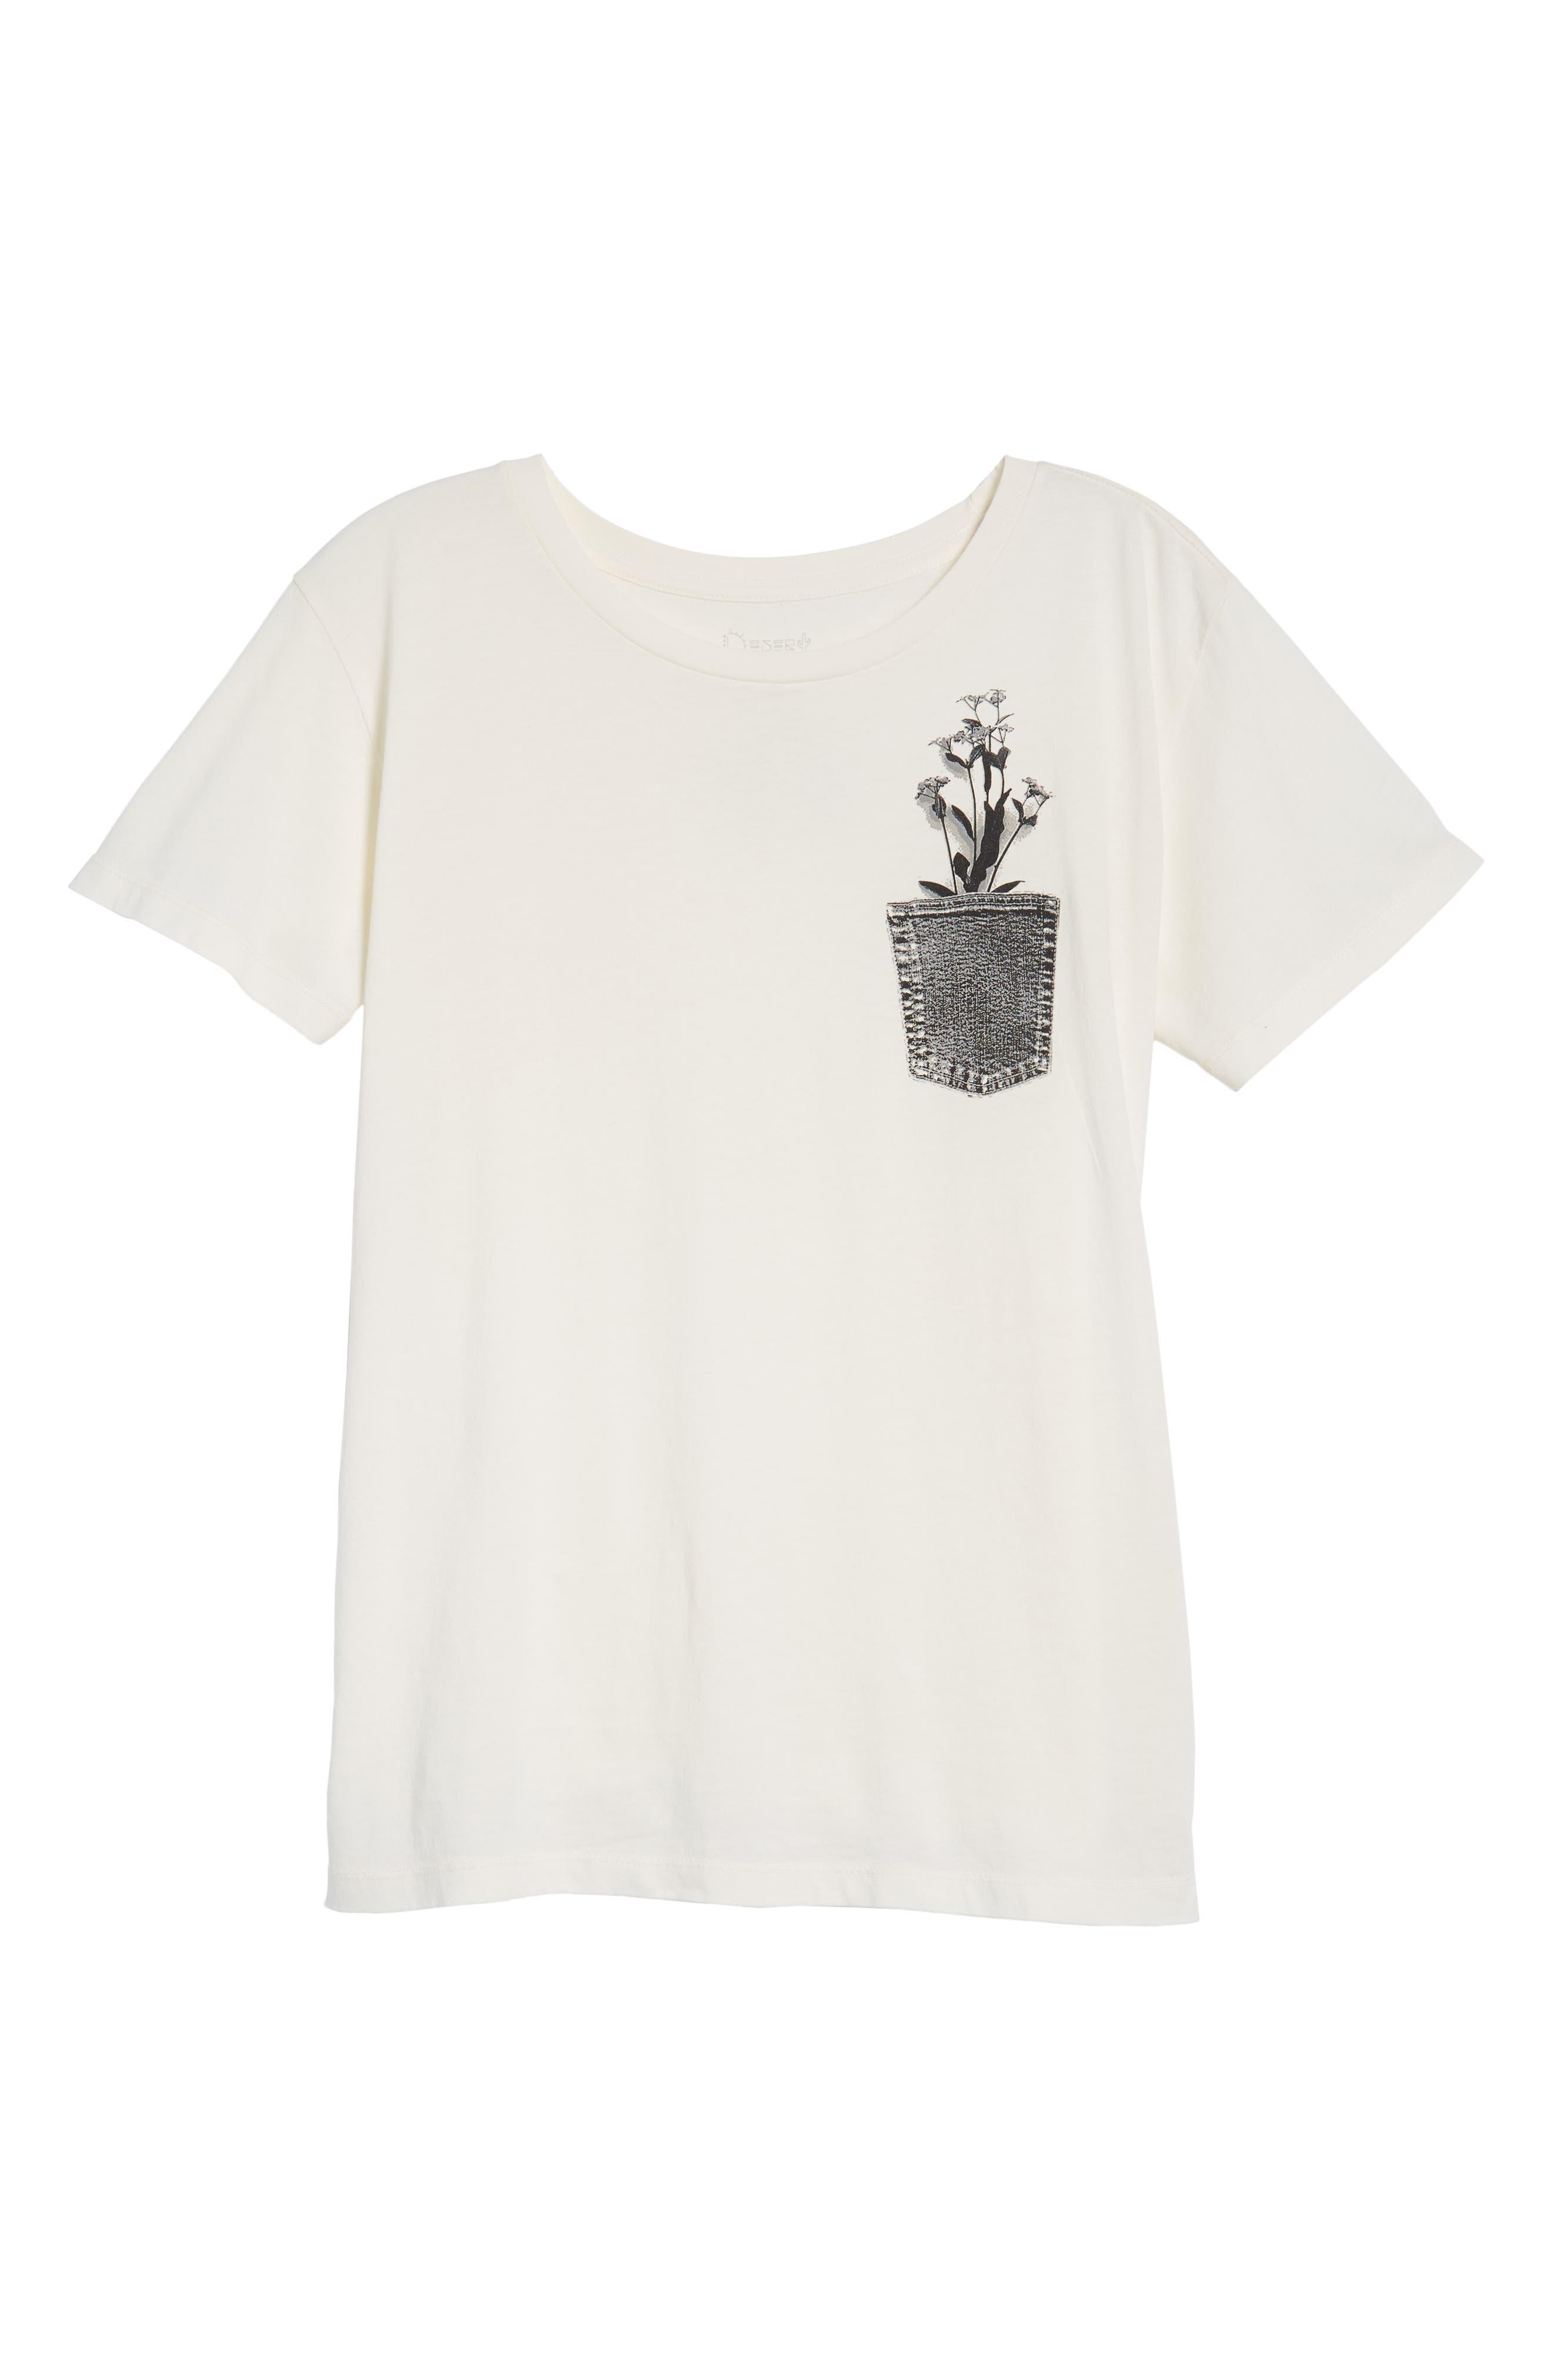 Flower Pocket Tee,                             Alternate thumbnail 7, color,                             Washed White